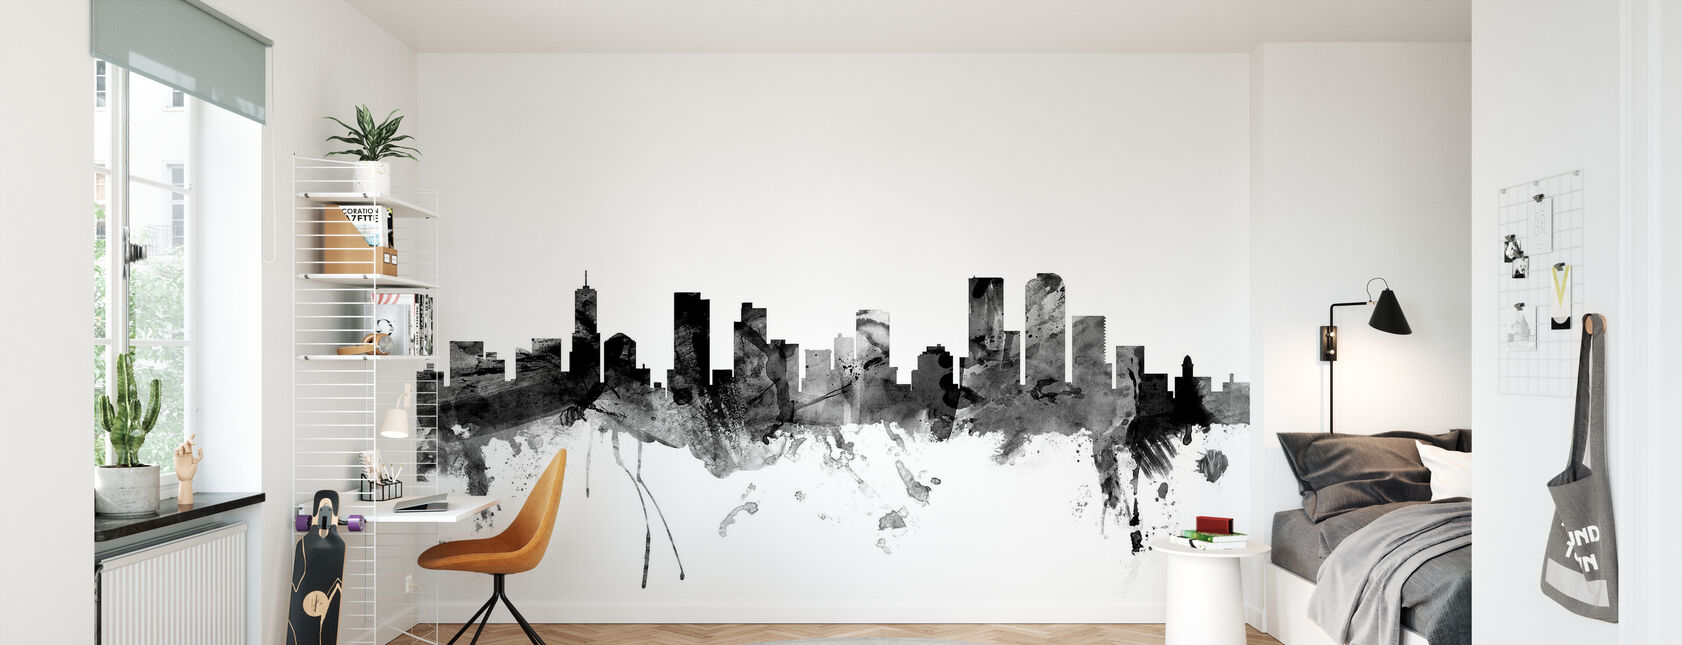 Denver Colorado Skyline Black - Wallpaper - Kids Room